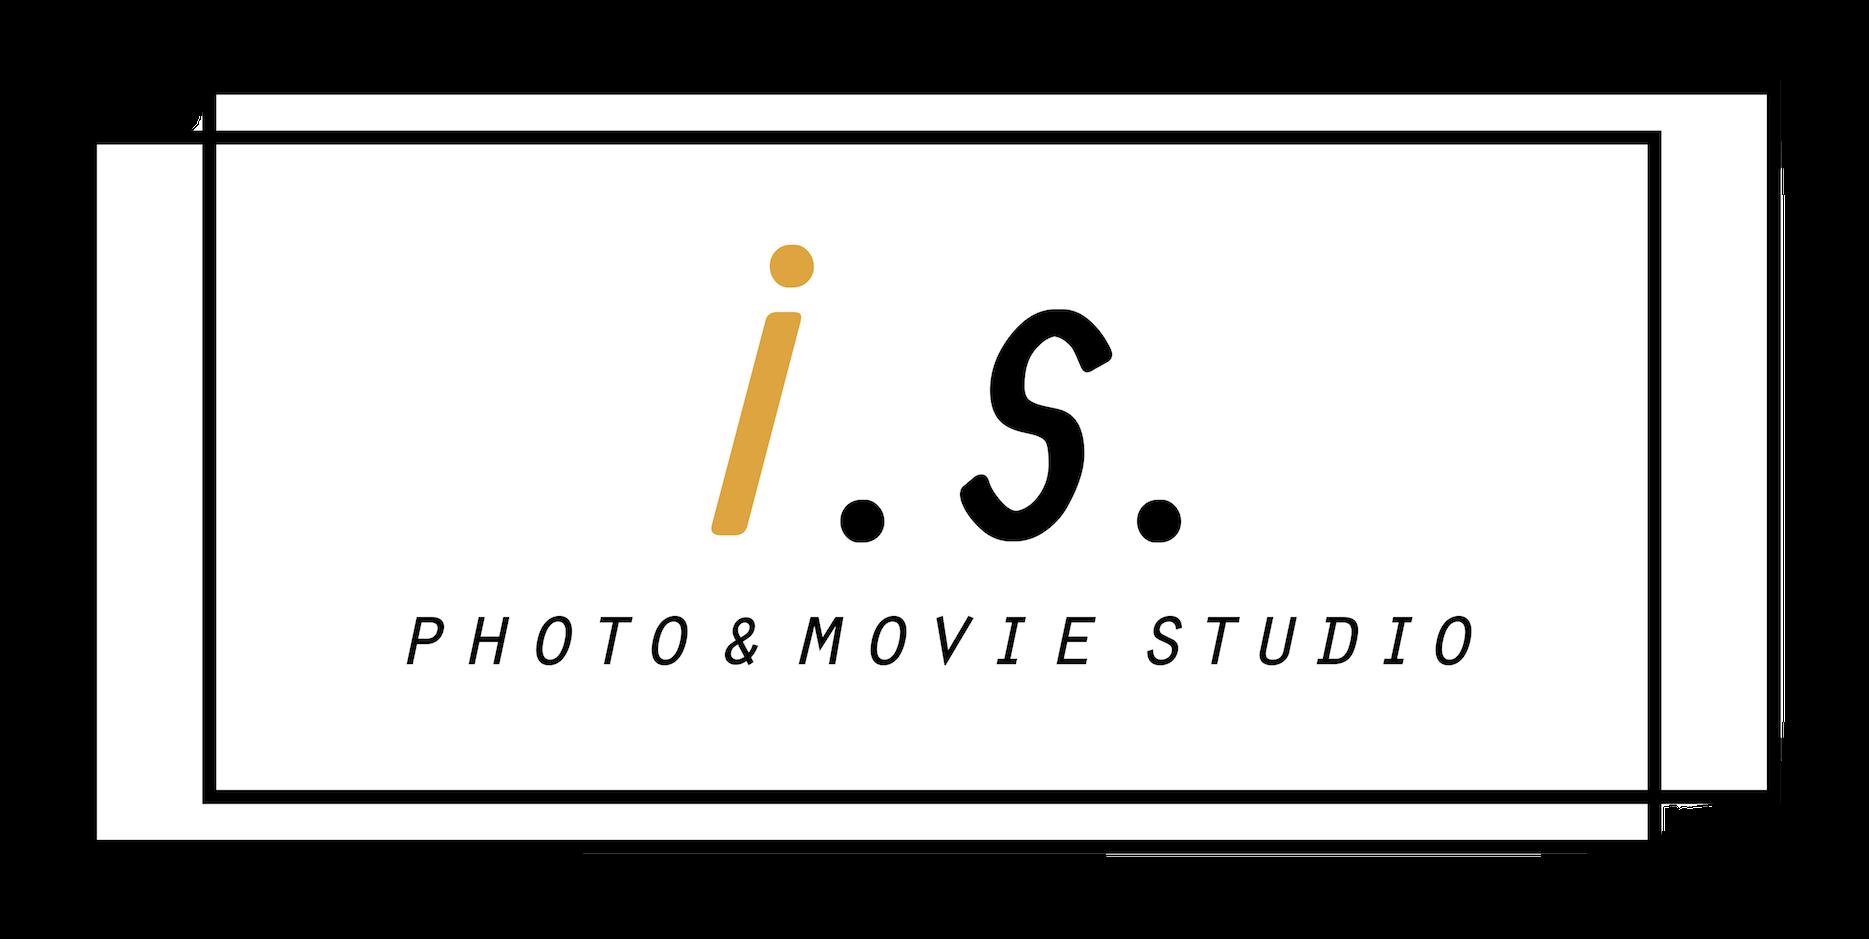 i.s. – セルフフォトスタジオ(セルフ写真館)